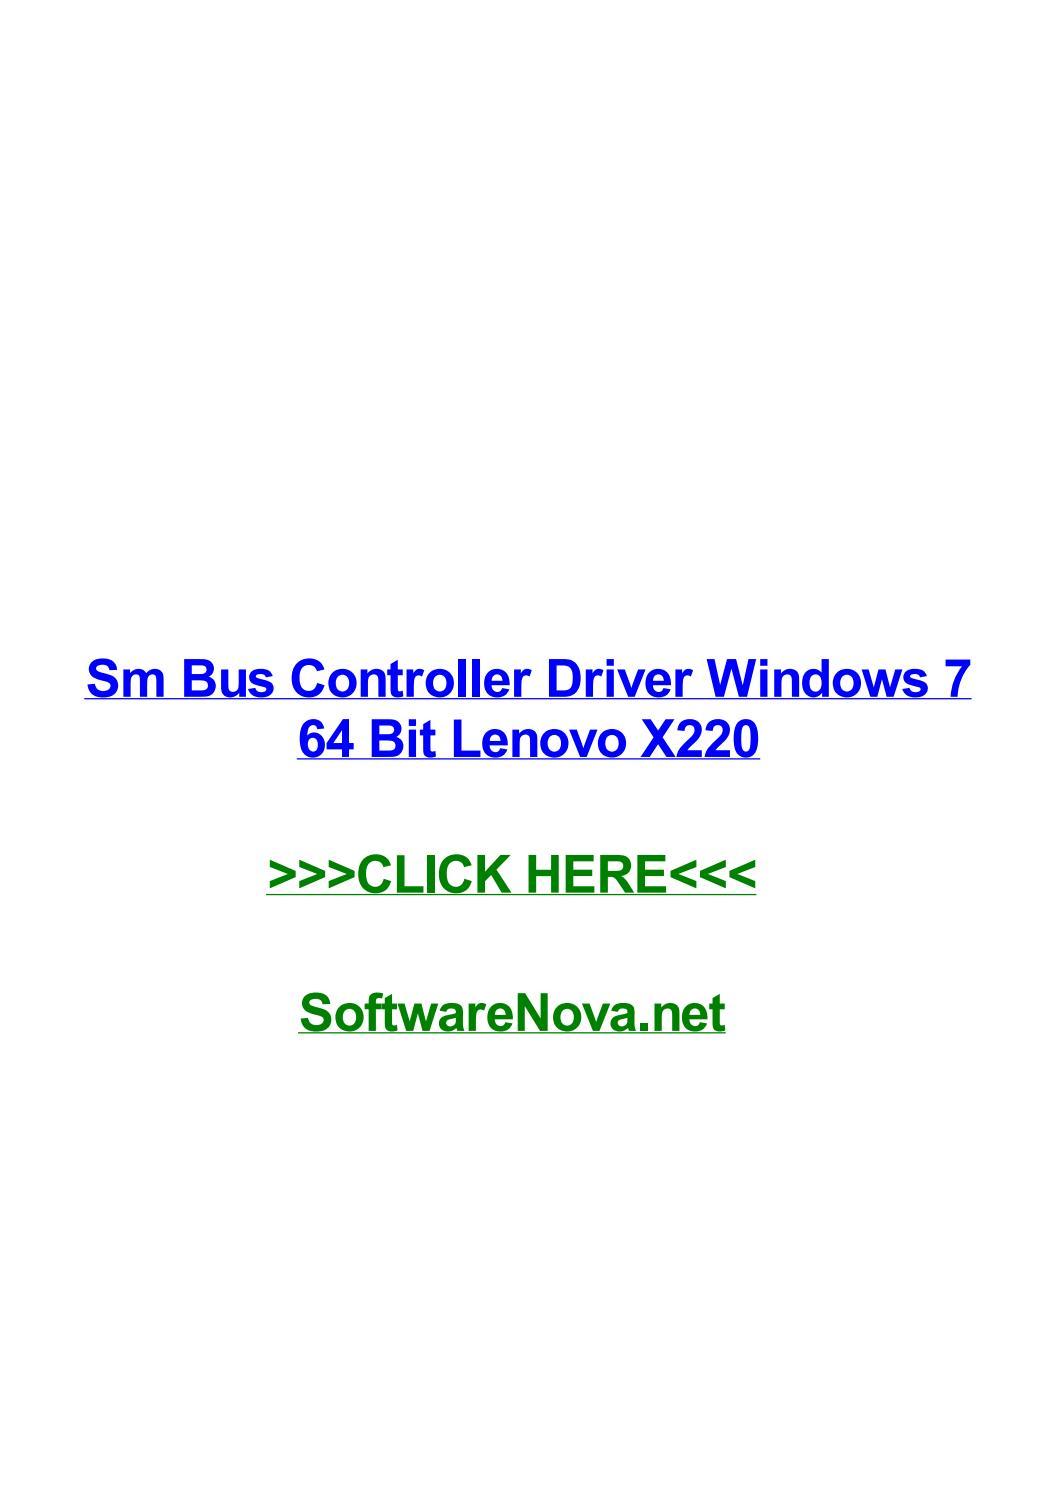 Sm bus controller driver windows 7 64 bit lenovo x220 by